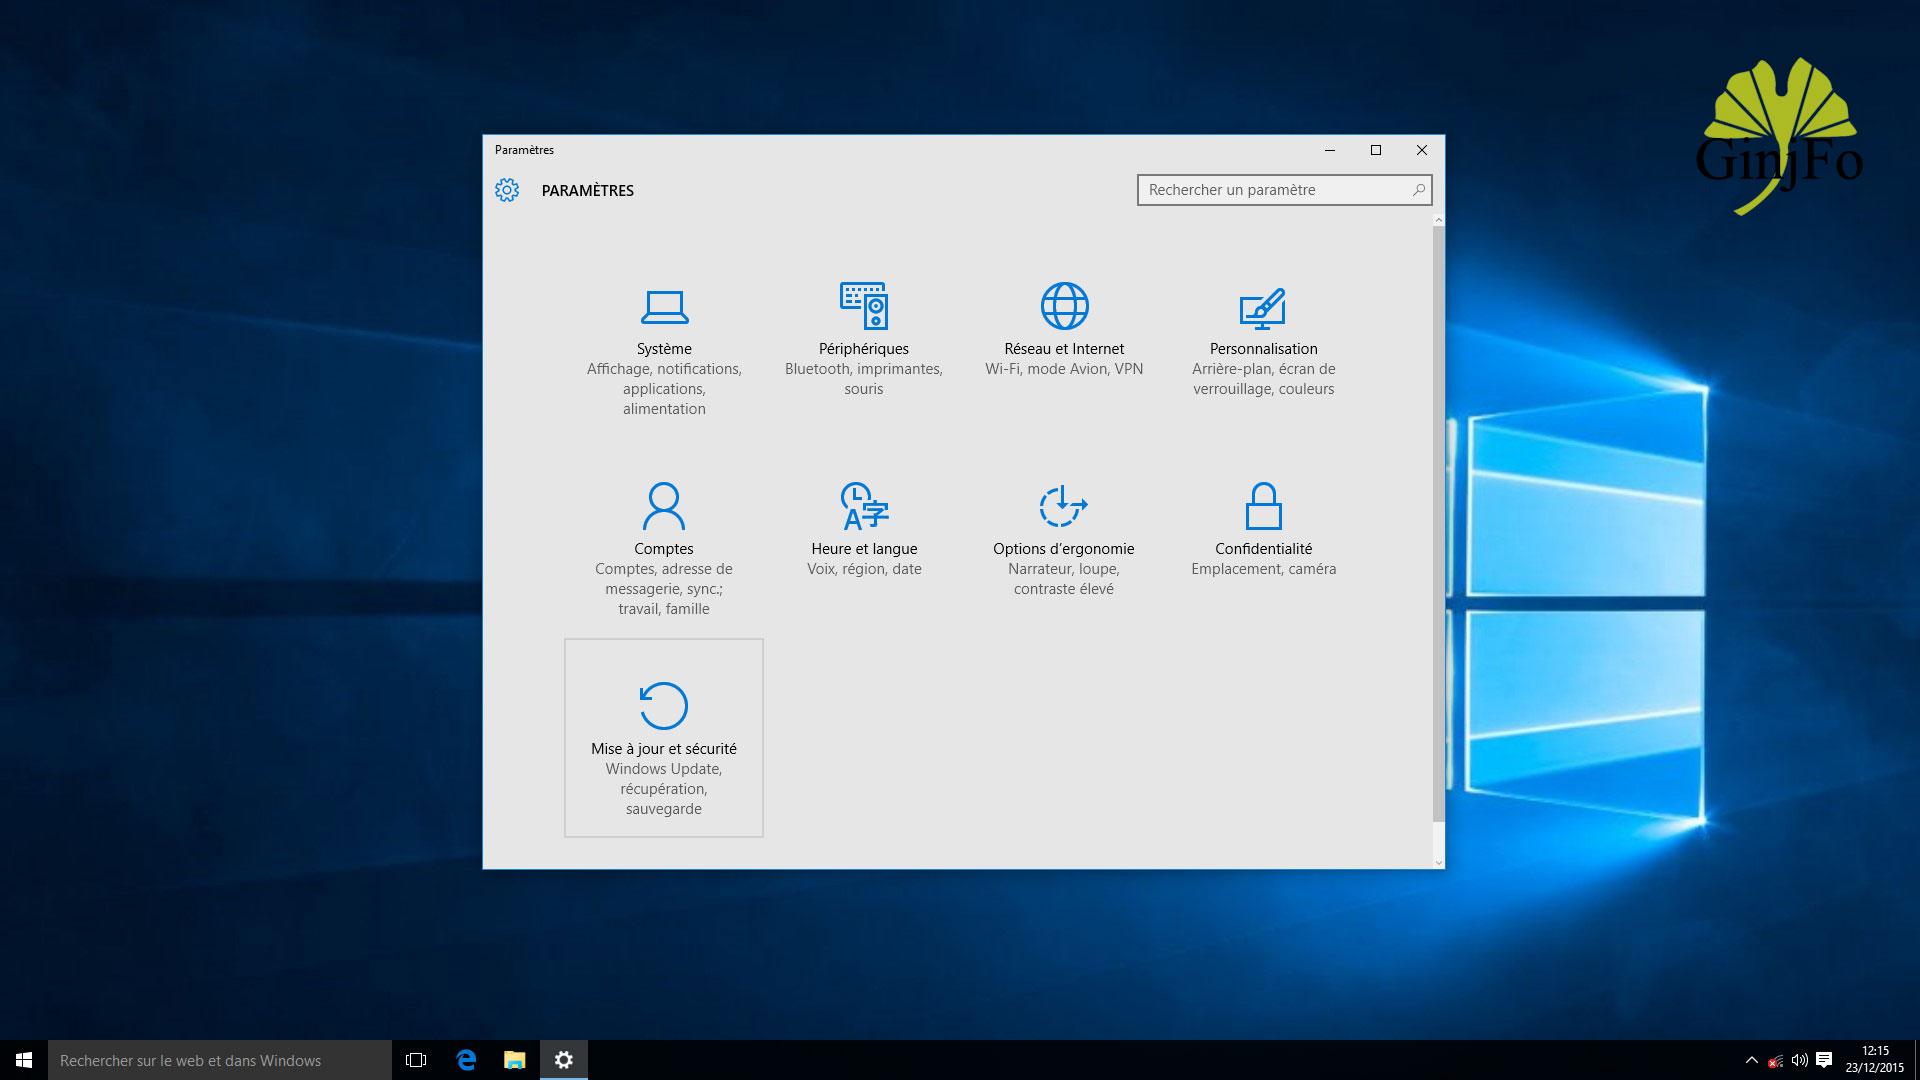 Windows 10 Comment Passer De La Version Home A Pro Ginjfo